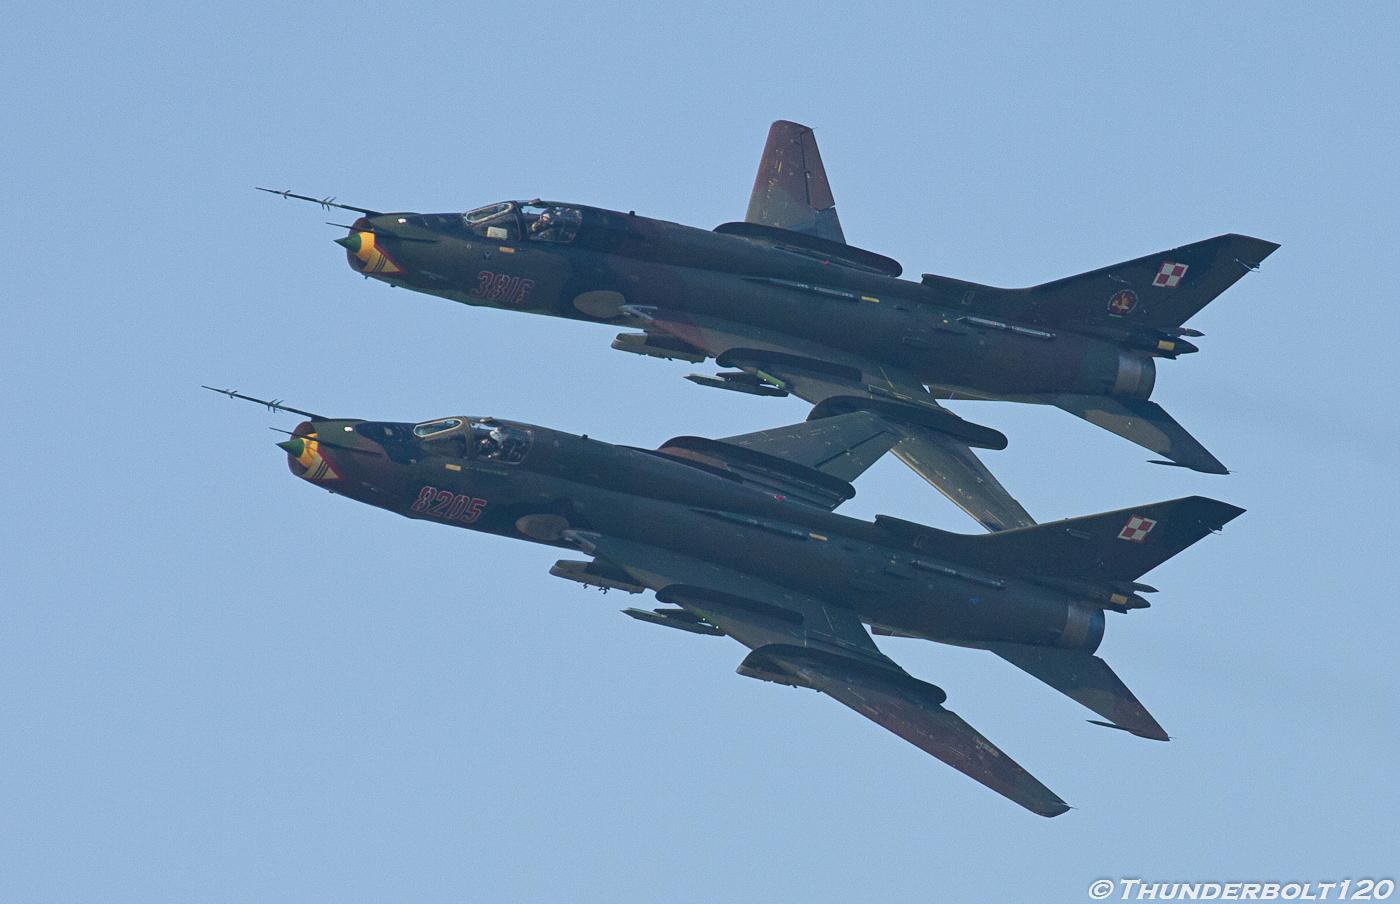 2x Su-22